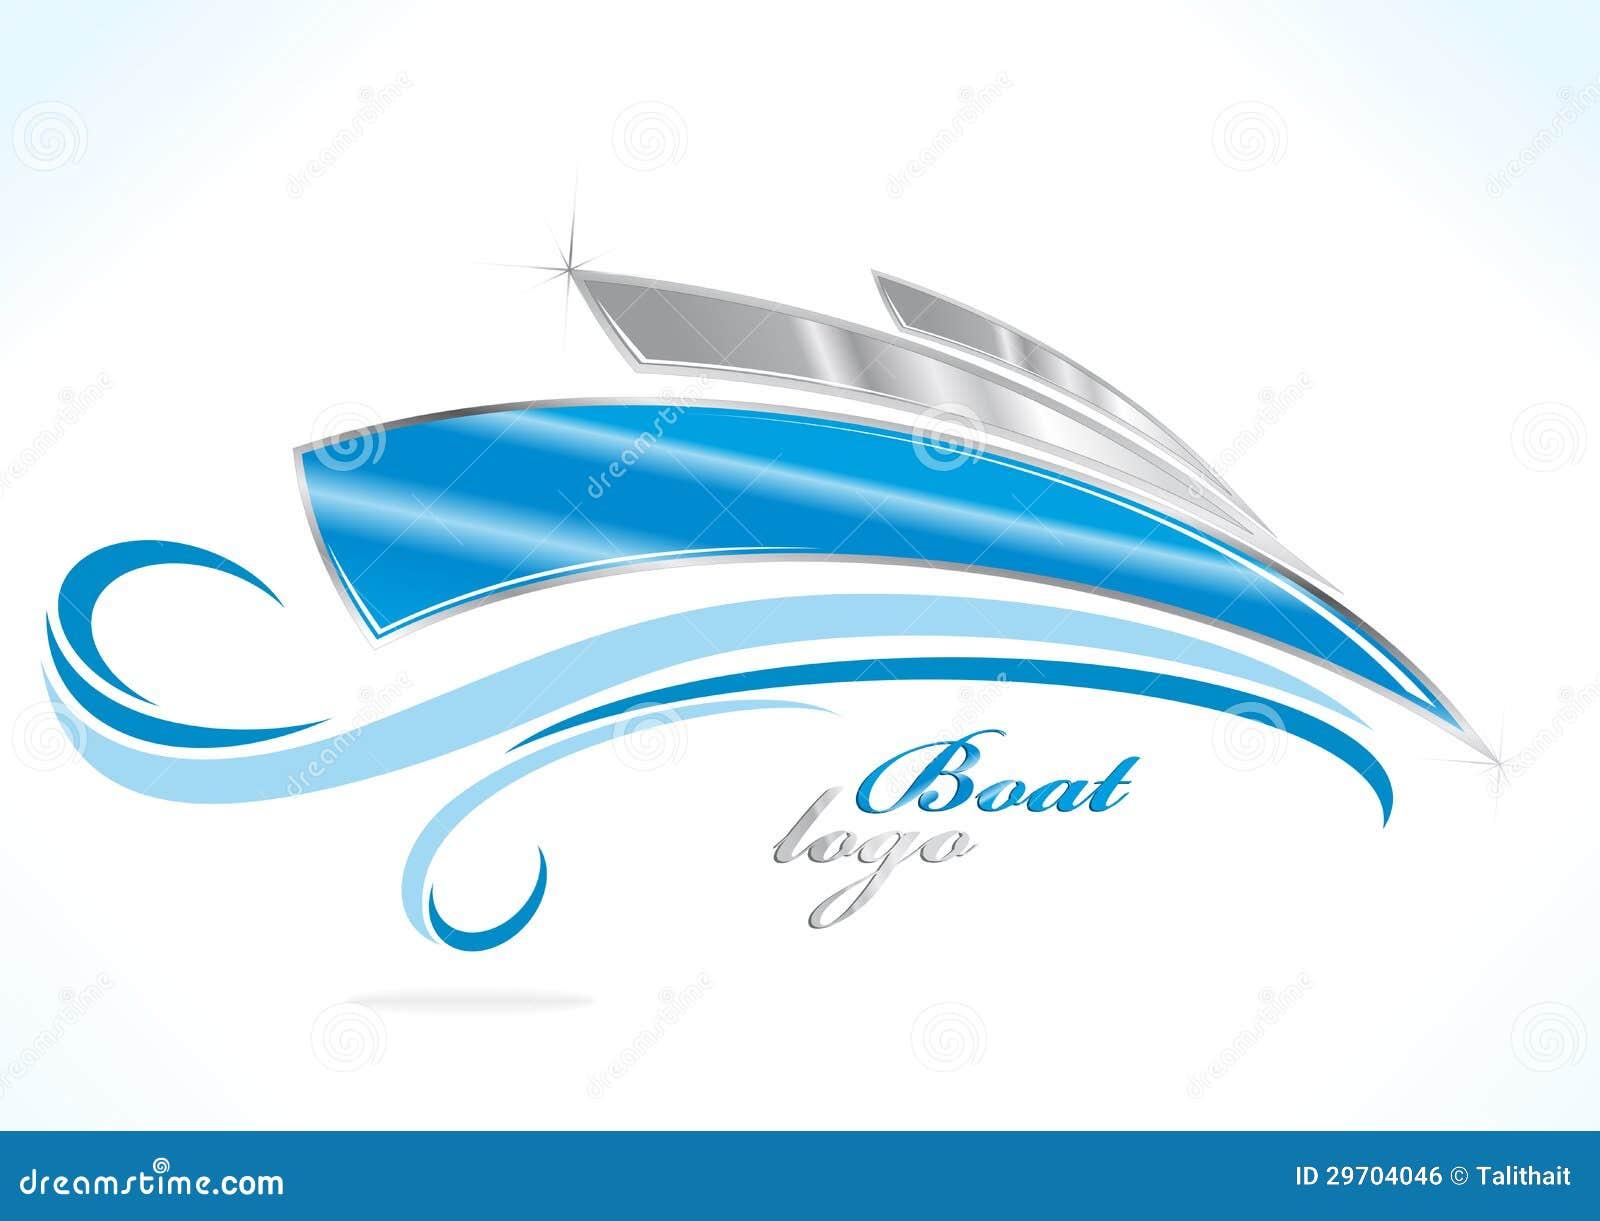 Business Boat Logo Royalty Free Stock Image - Image: 29704046